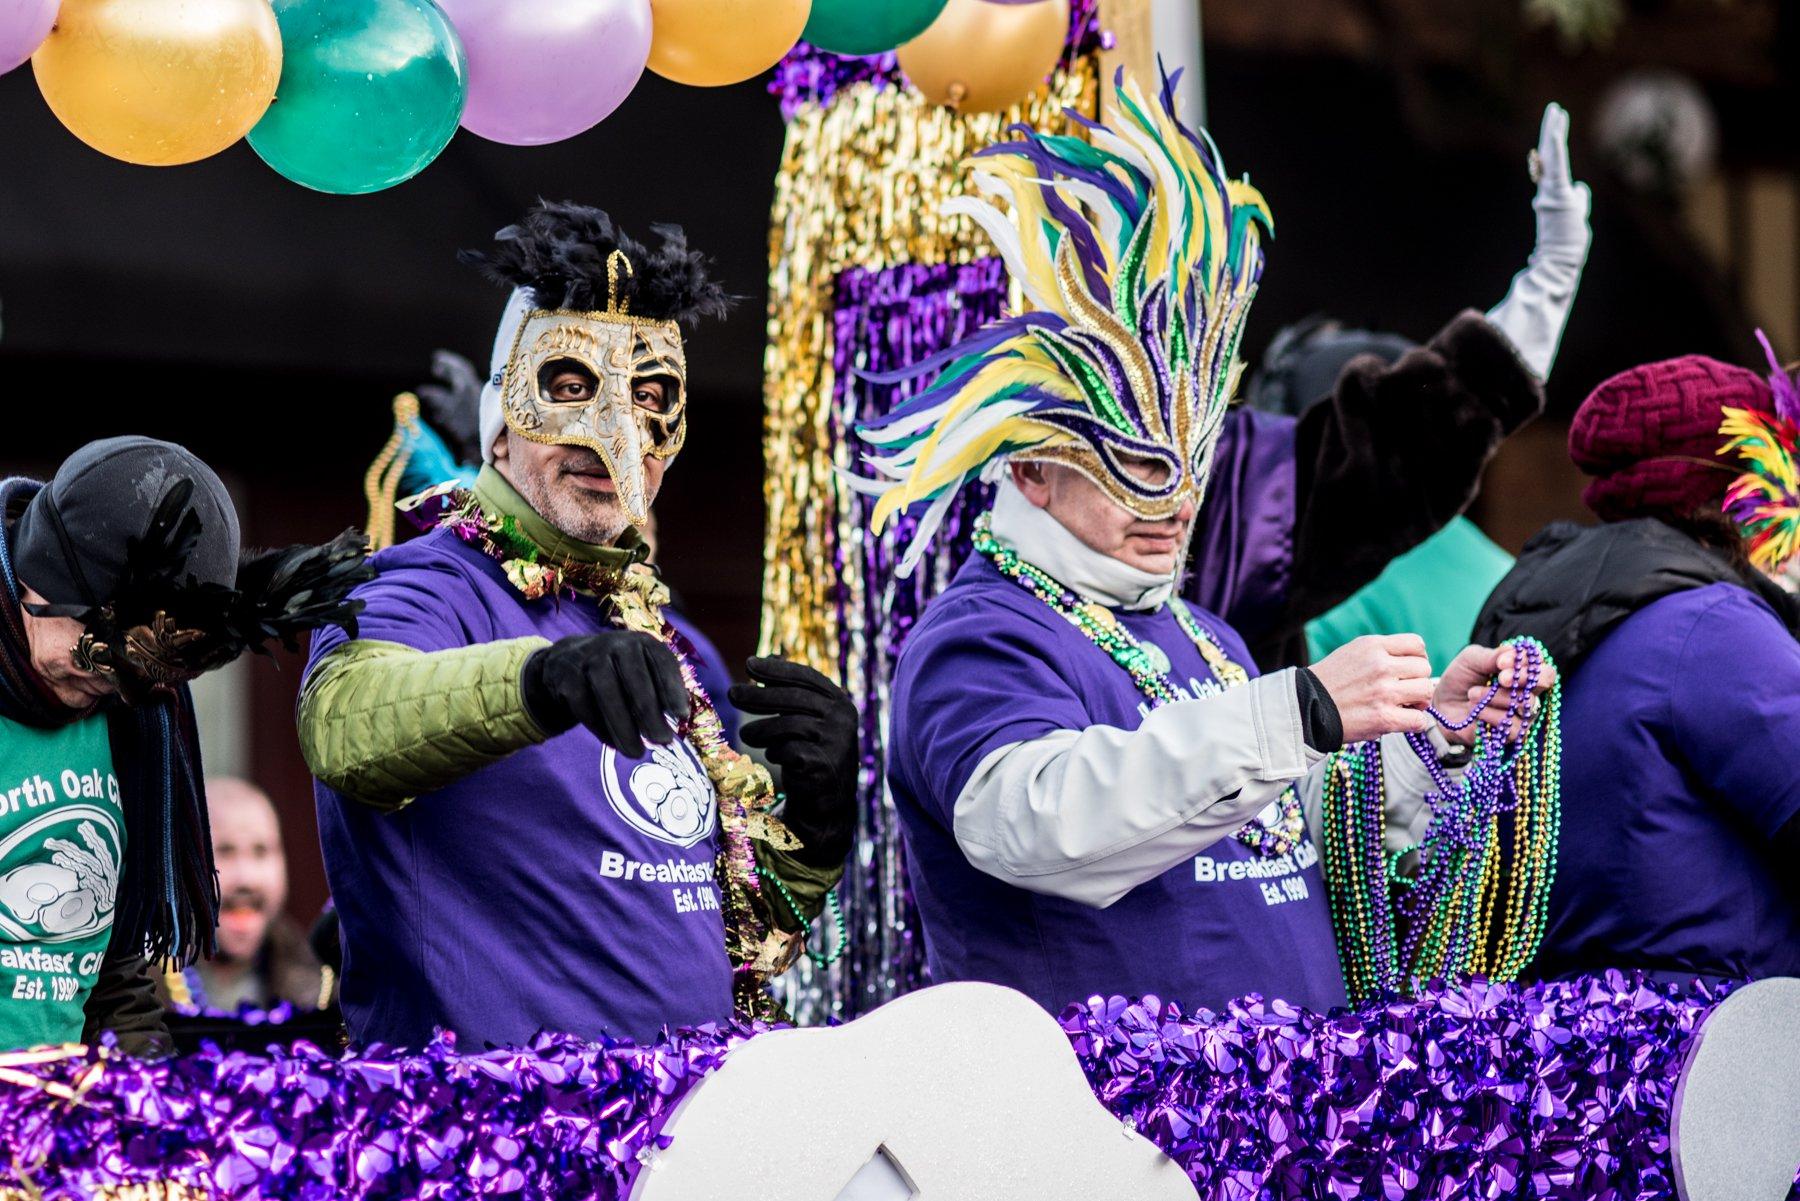 D-Magazine-Nightlife-Oak-Cliff-Mardi-Gras-Parade-2018-021118